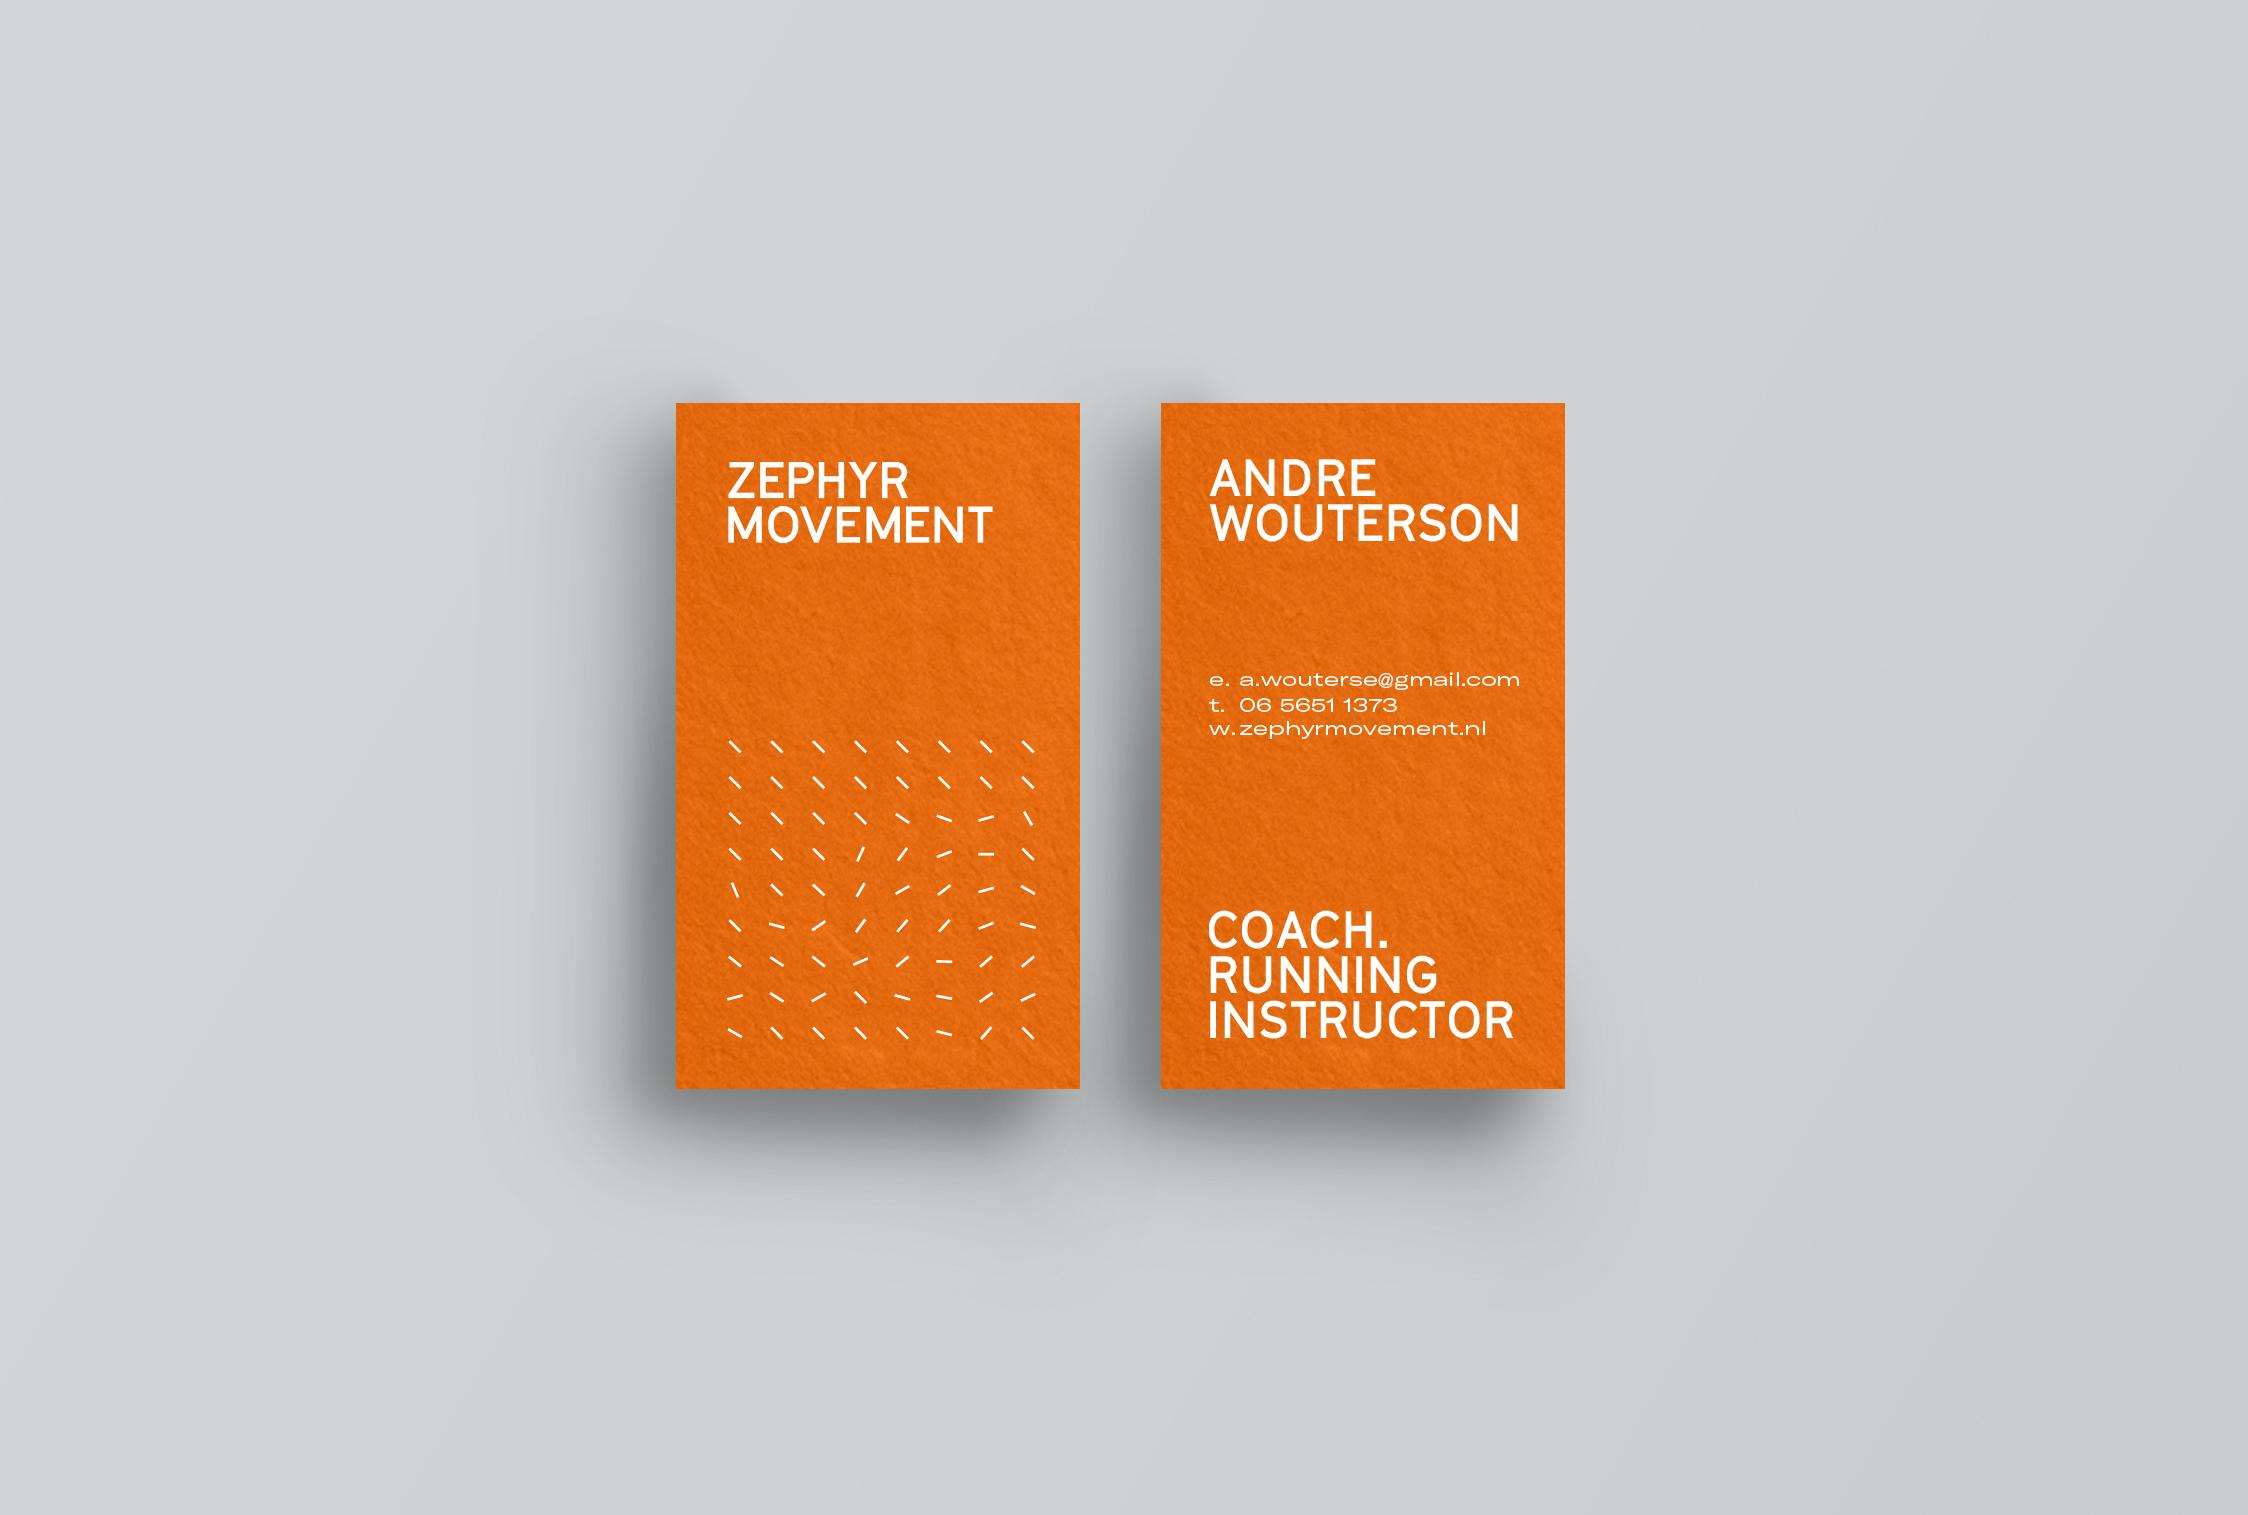 business-card-design-zephyr-movement.jpg